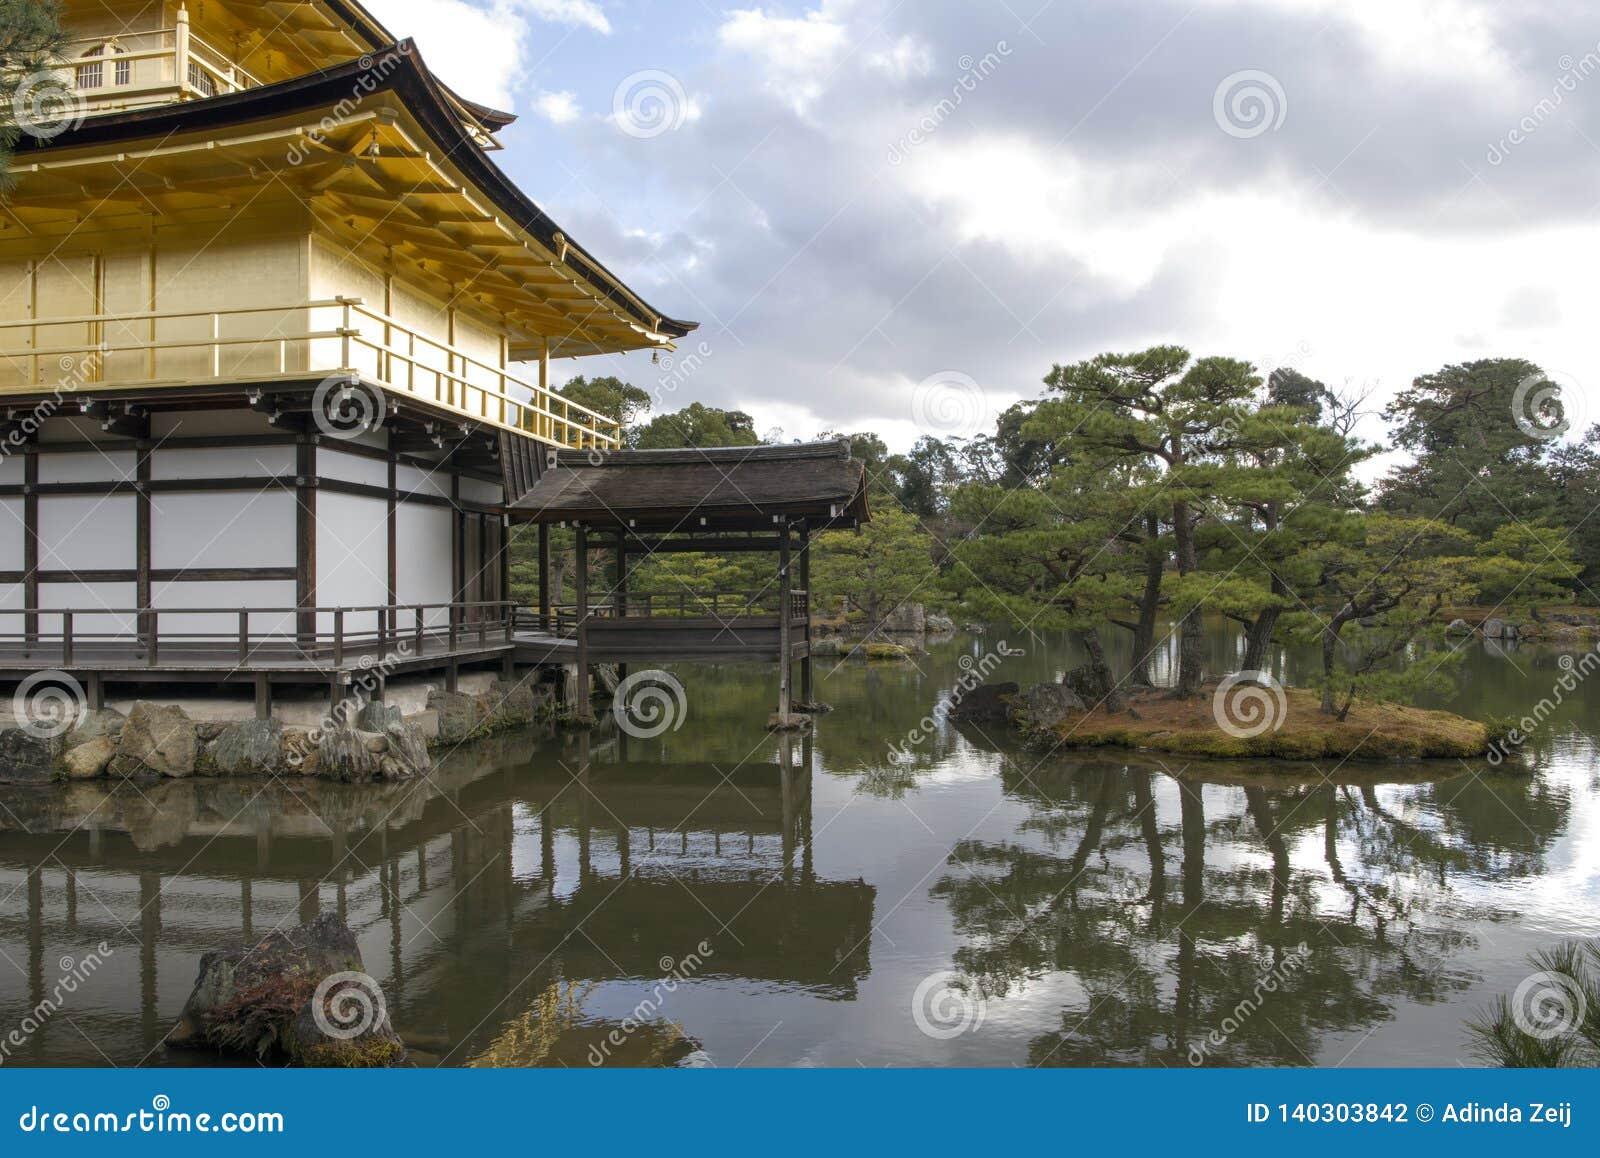 The garden at Kinkakuji Temple in Kyoto, Japan